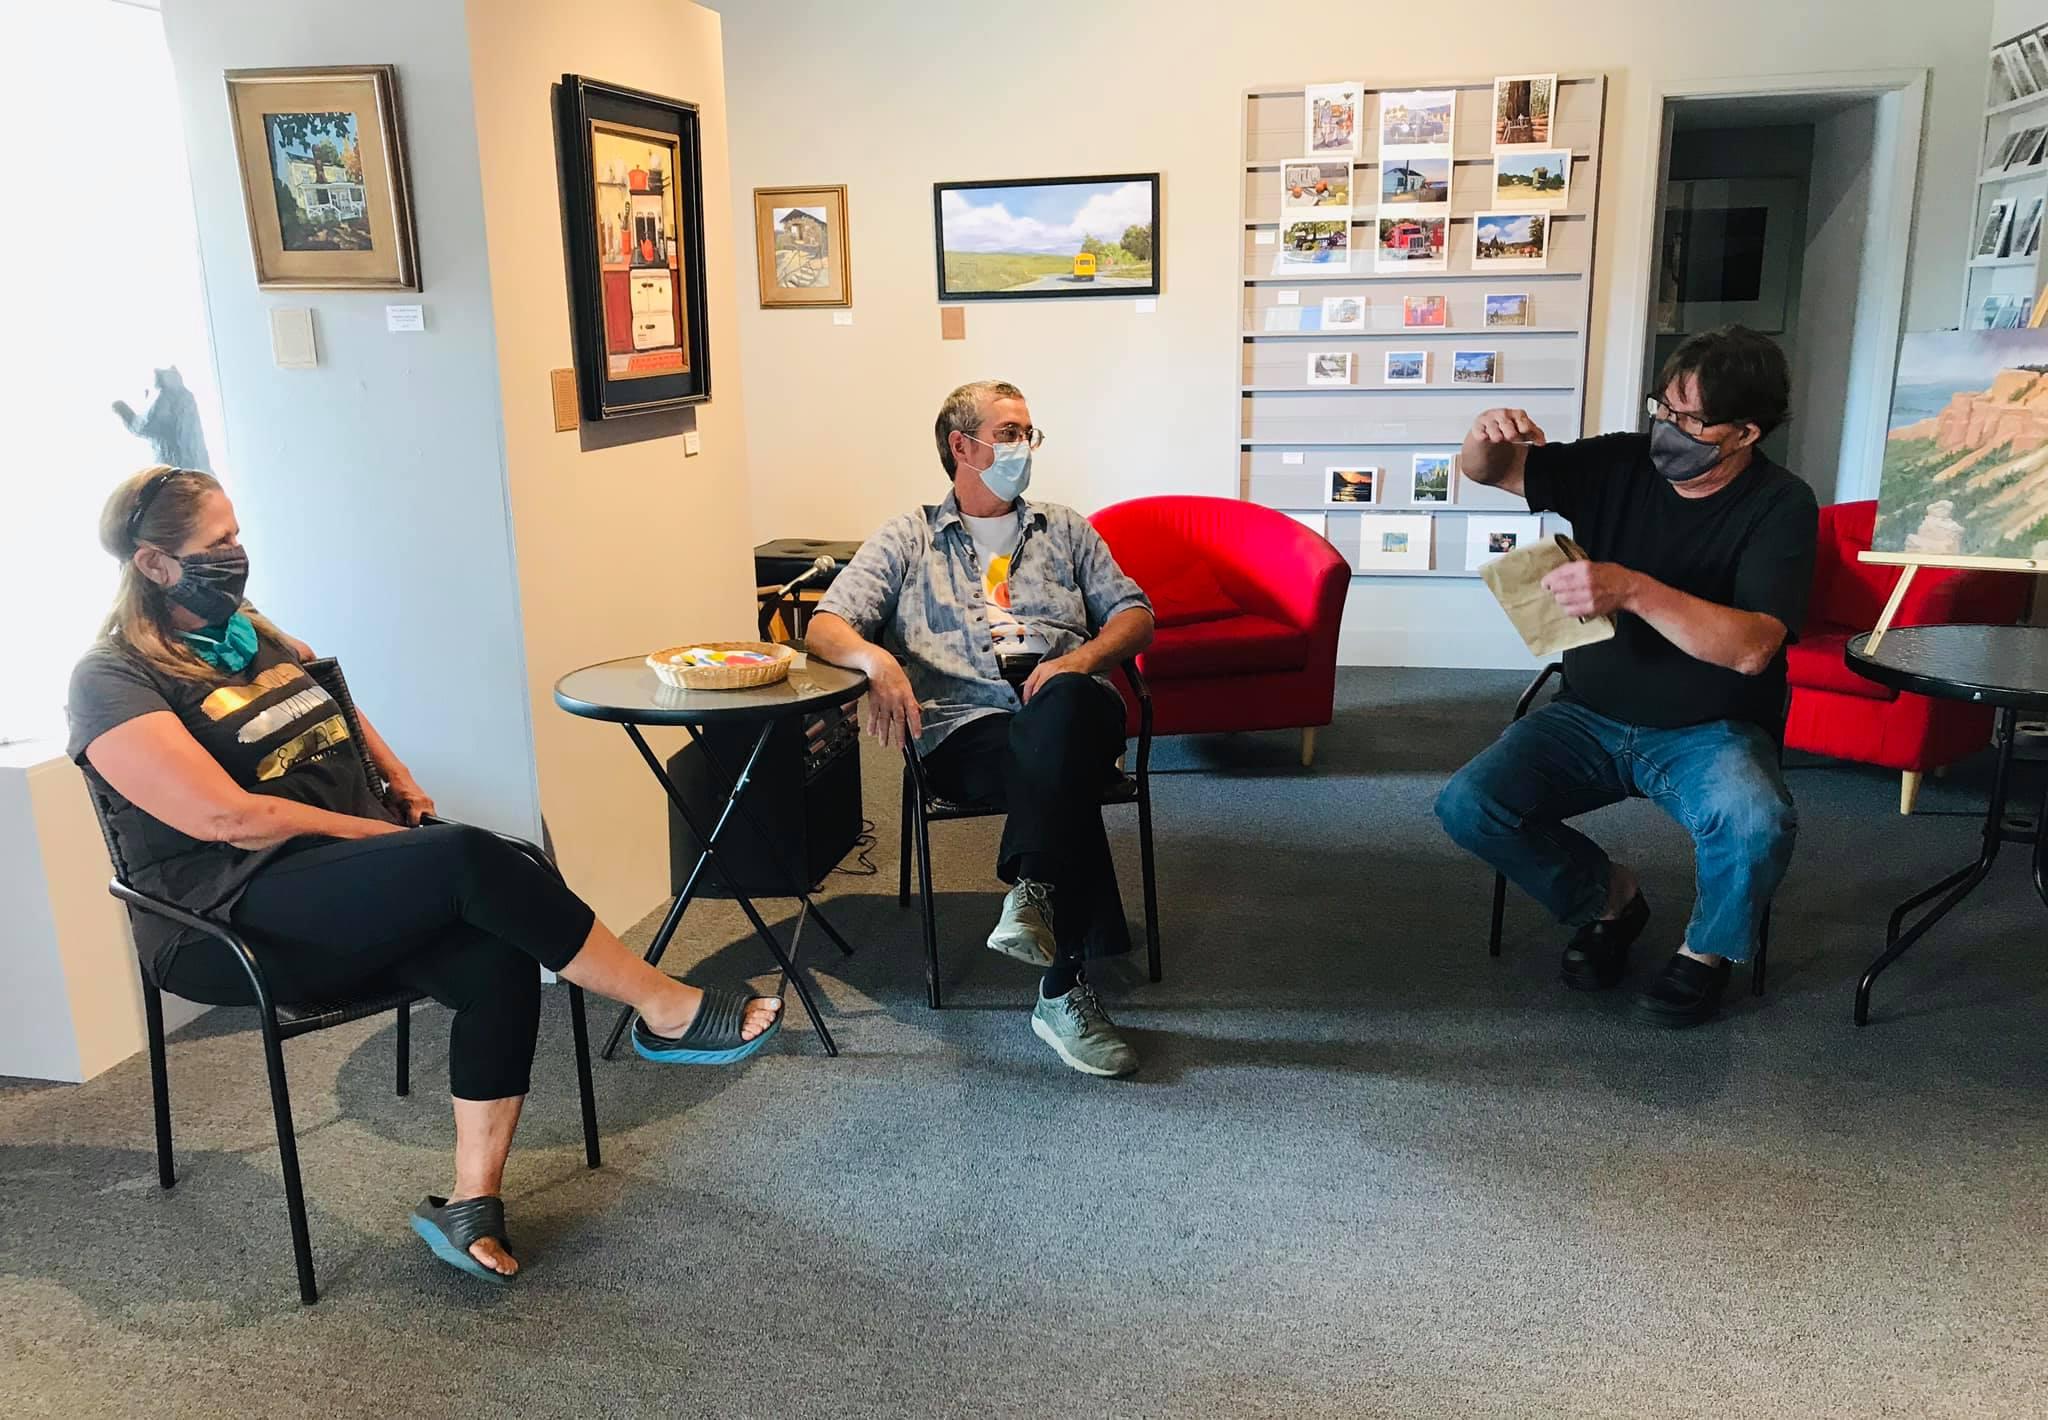 Artists Faith Rumm, Jon Bock, and Jon Kifer swapping stories at the Art Center Gallery